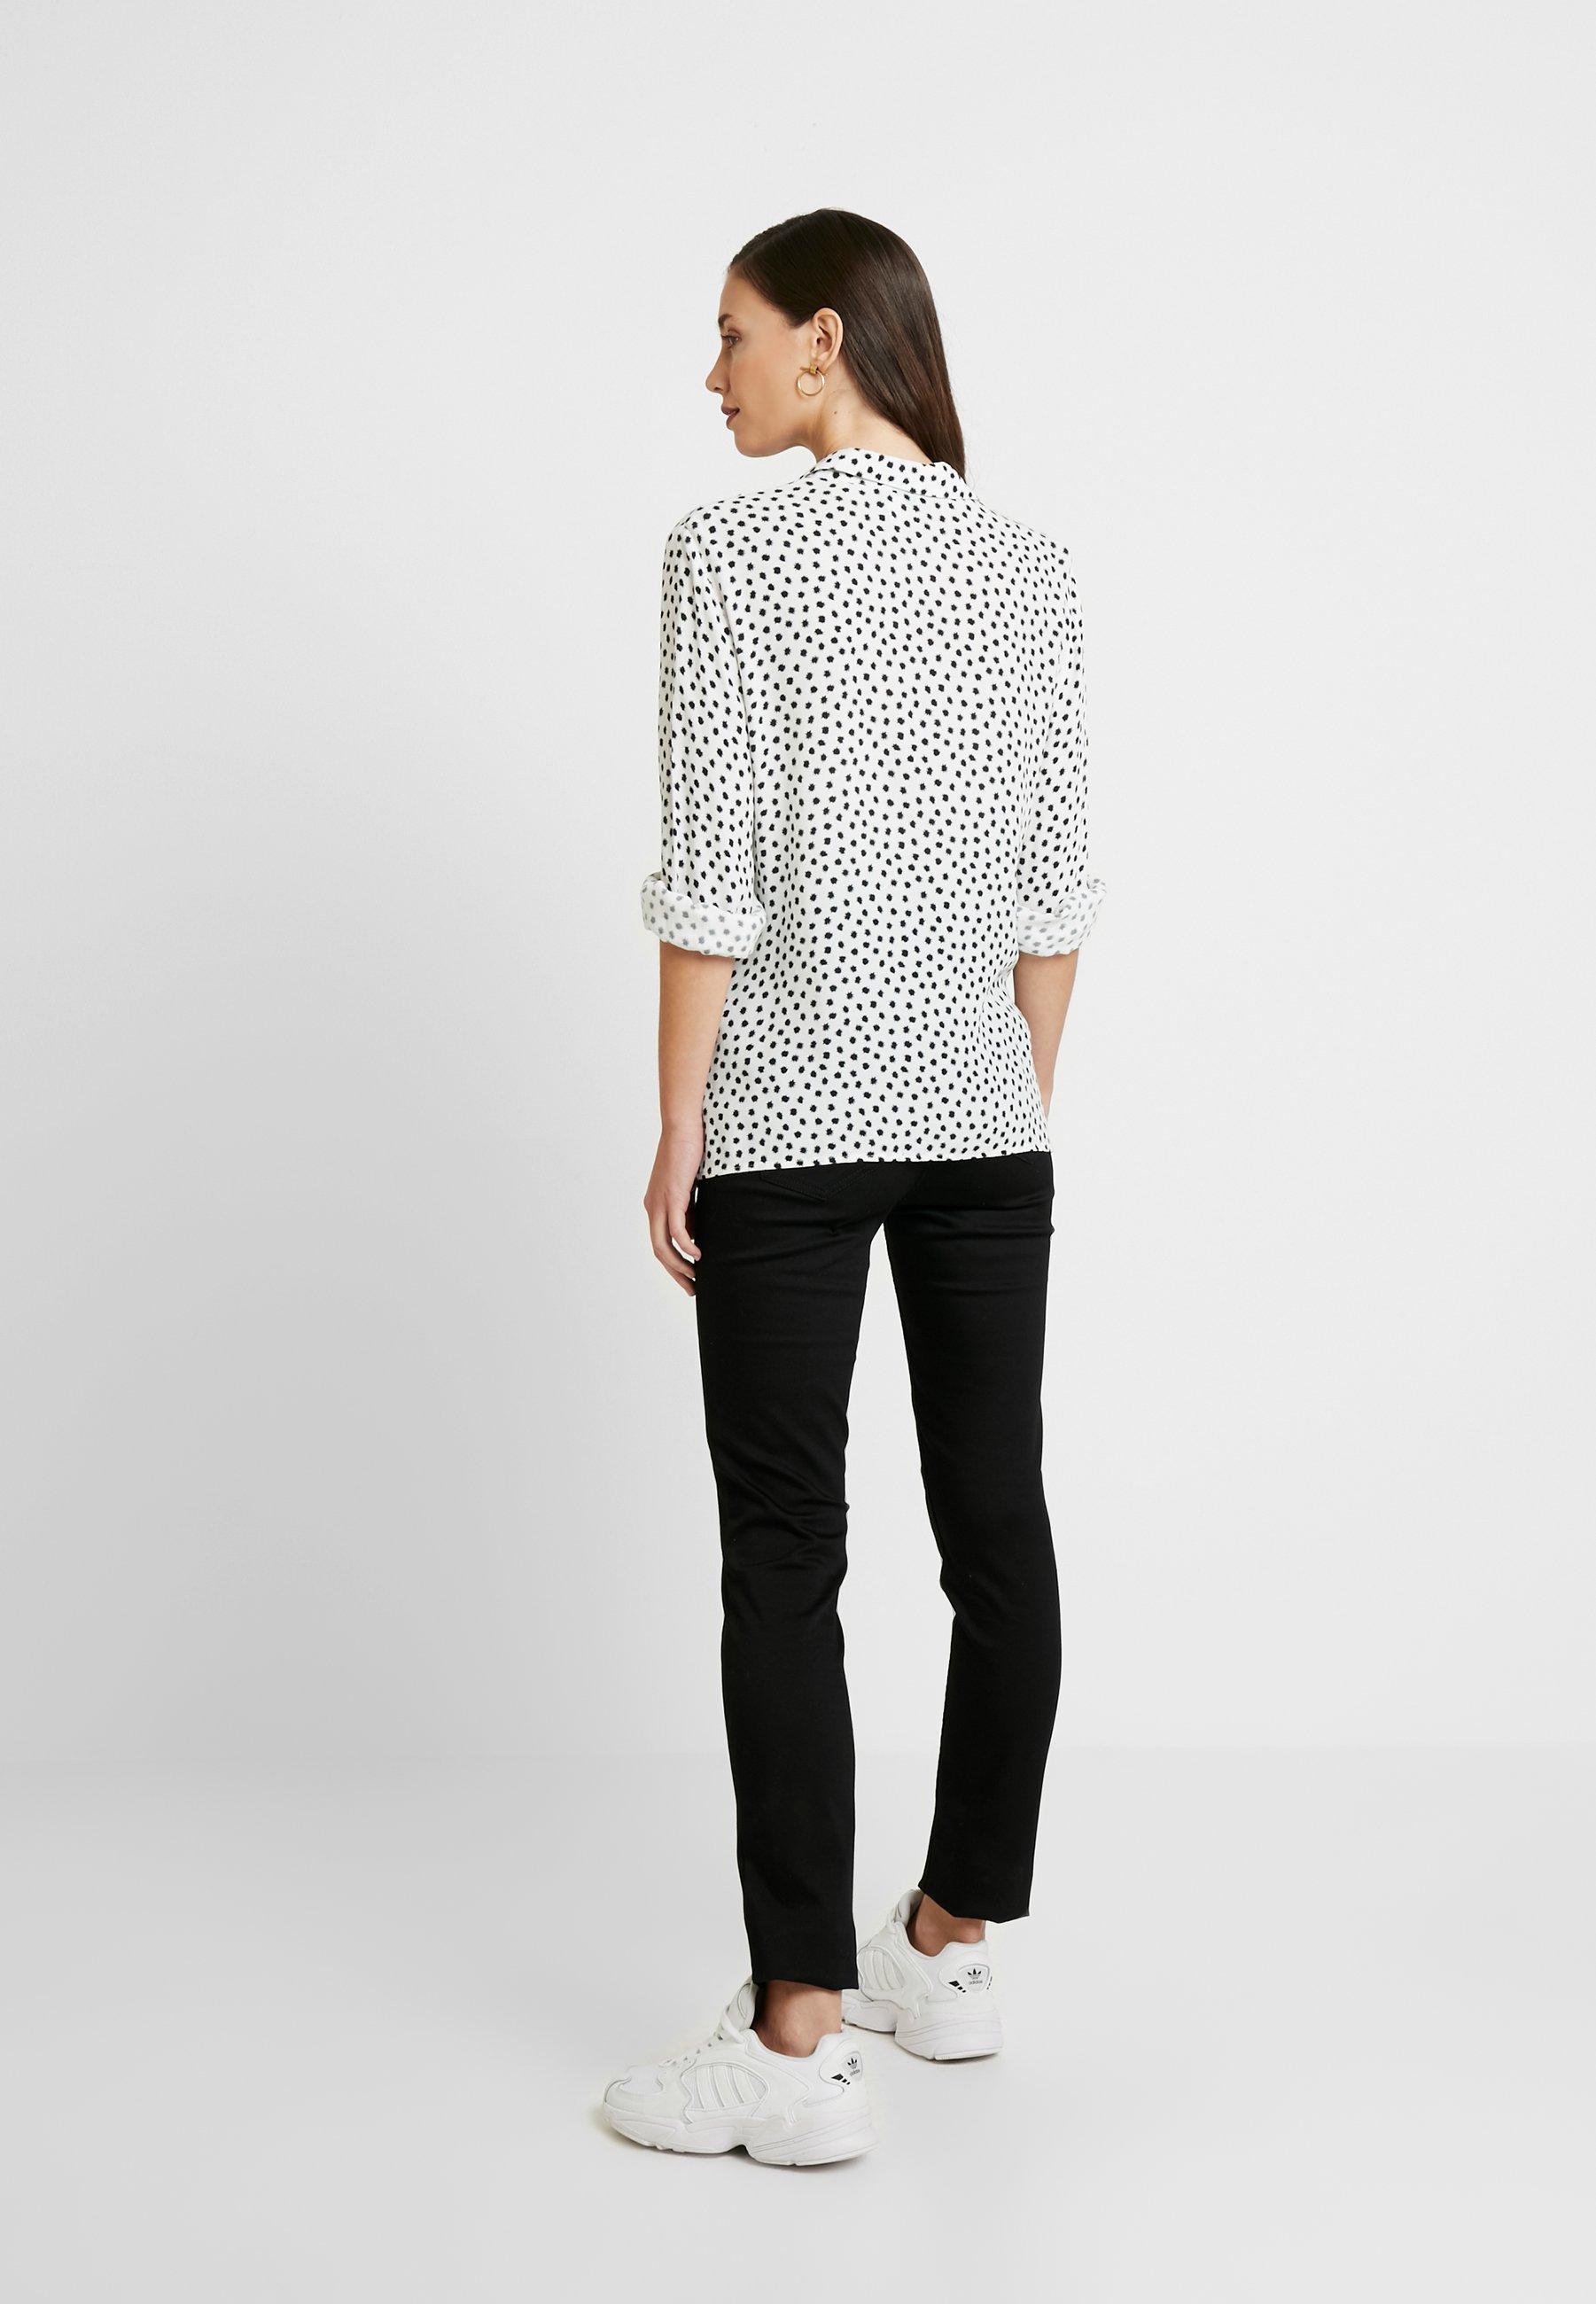 Latest Discount Women's Clothing Esprit Maternity PANTS SLIM Straight leg jeans black 3nKWF4Ptq